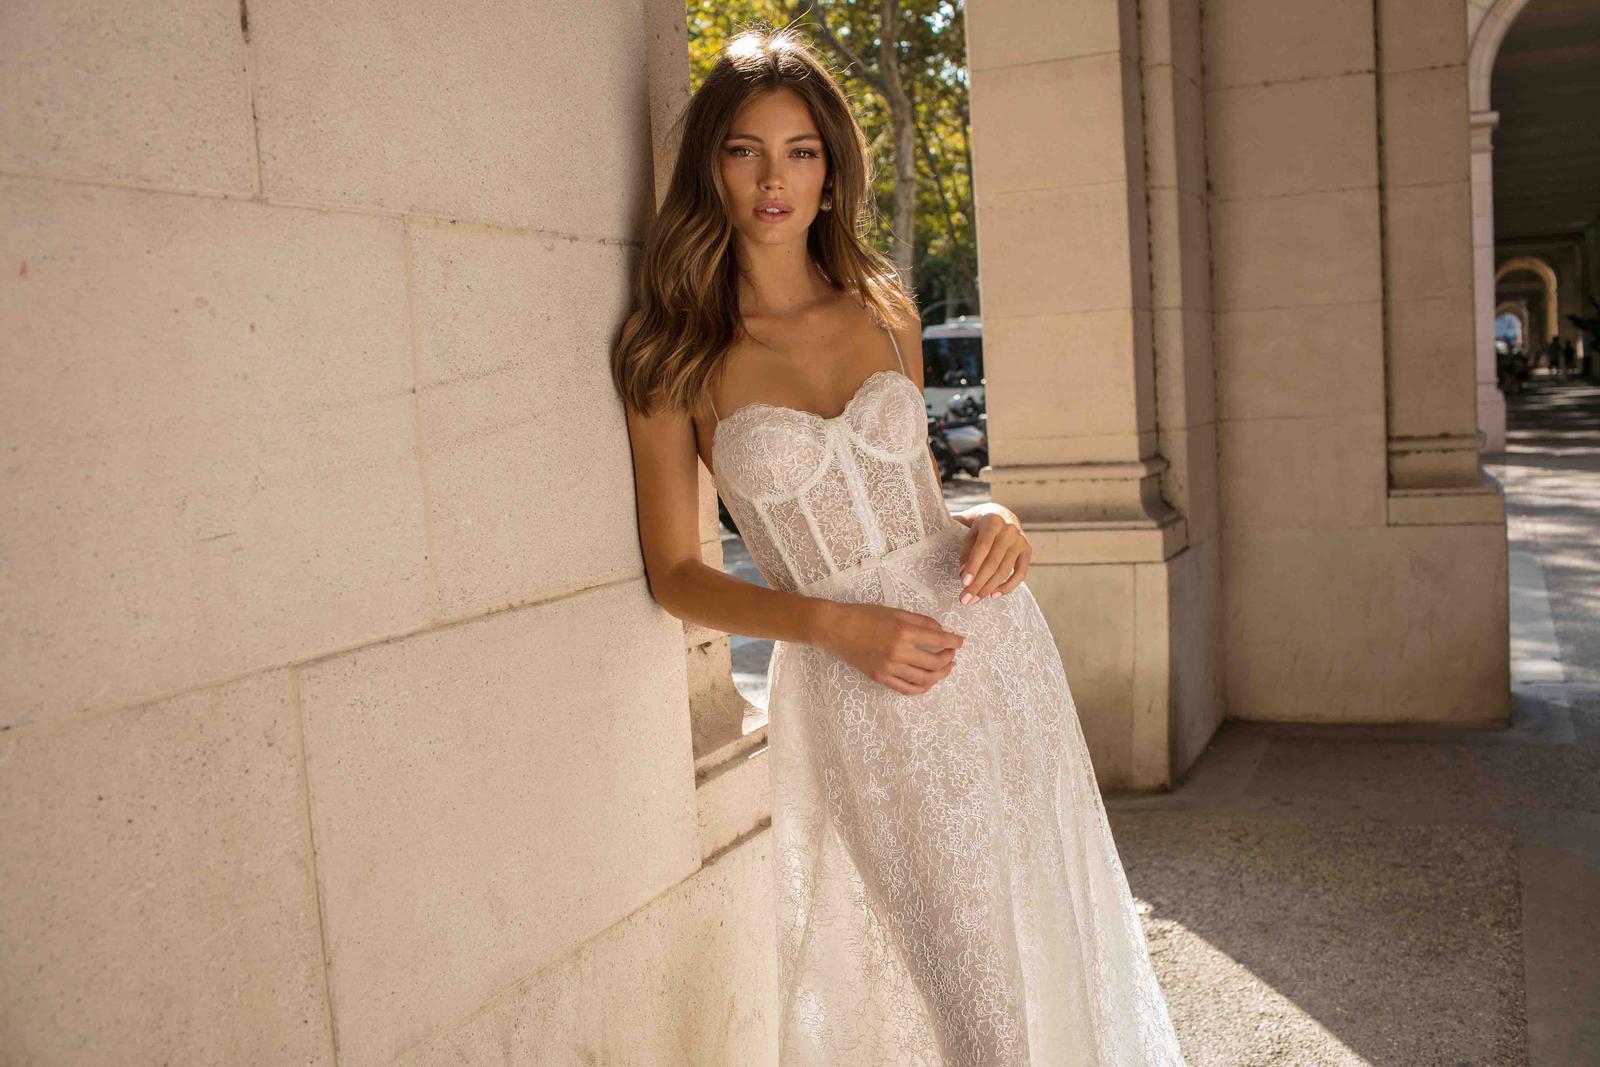 Muse by Berta * Svadobné šaty z kolekcií na rok 2019 - Obrázok č. 32